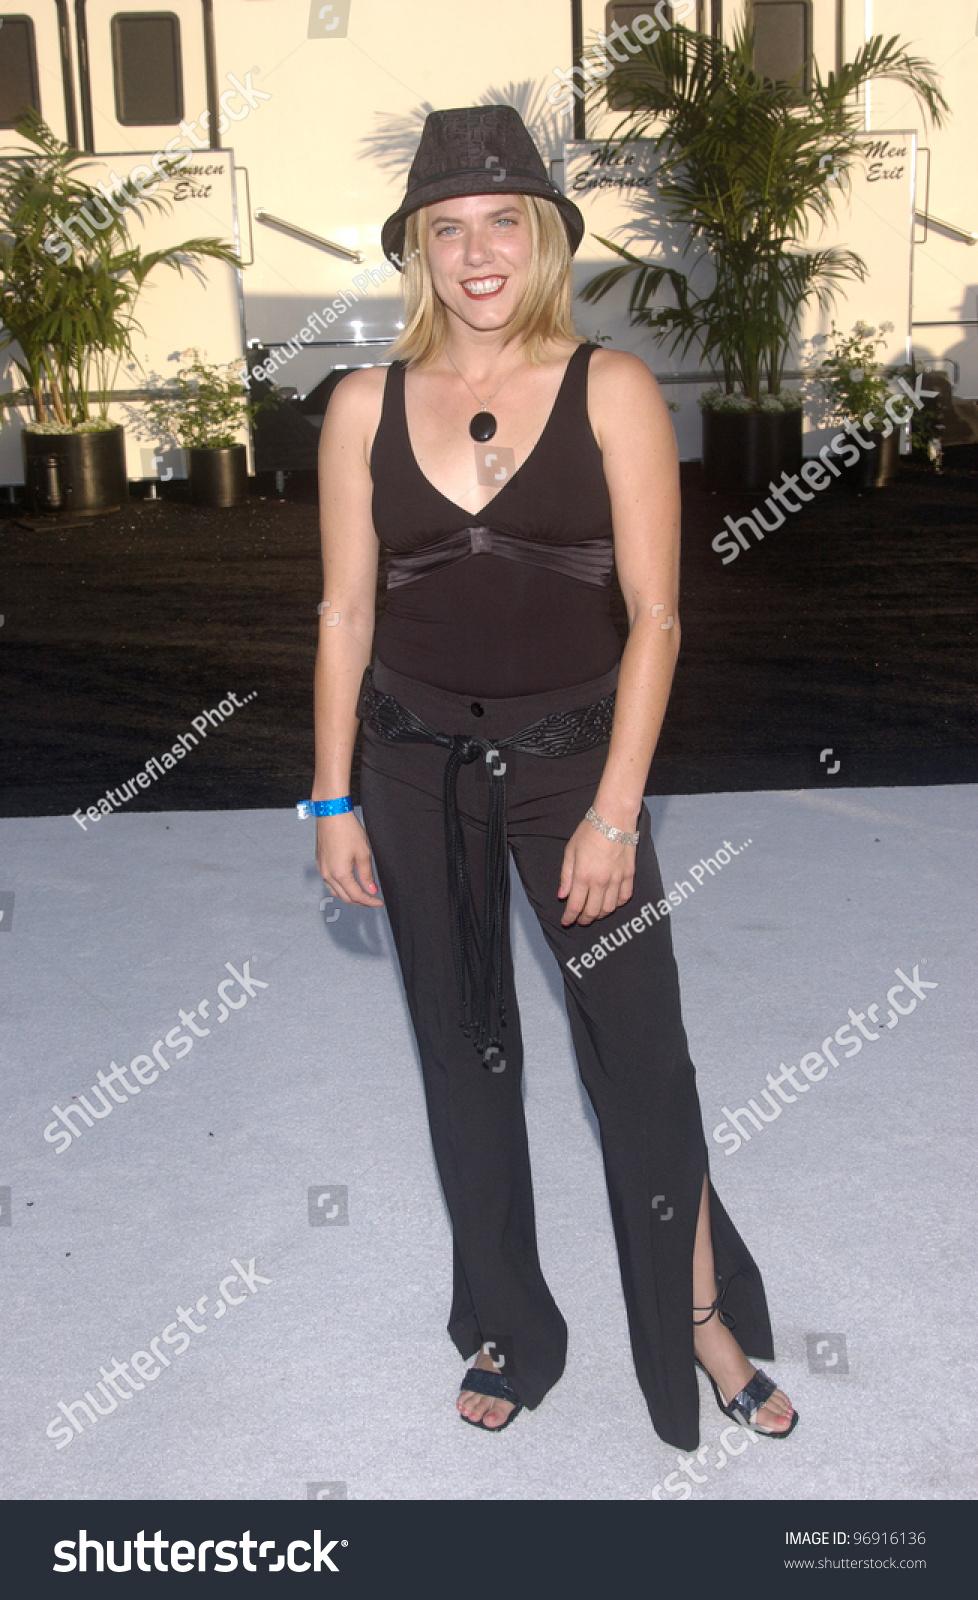 Rose McGowan (born 1973 (American actress born in Florence, Italy),Hayden Panettiere XXX tube Diana Lynn,Urvashi Dholakia